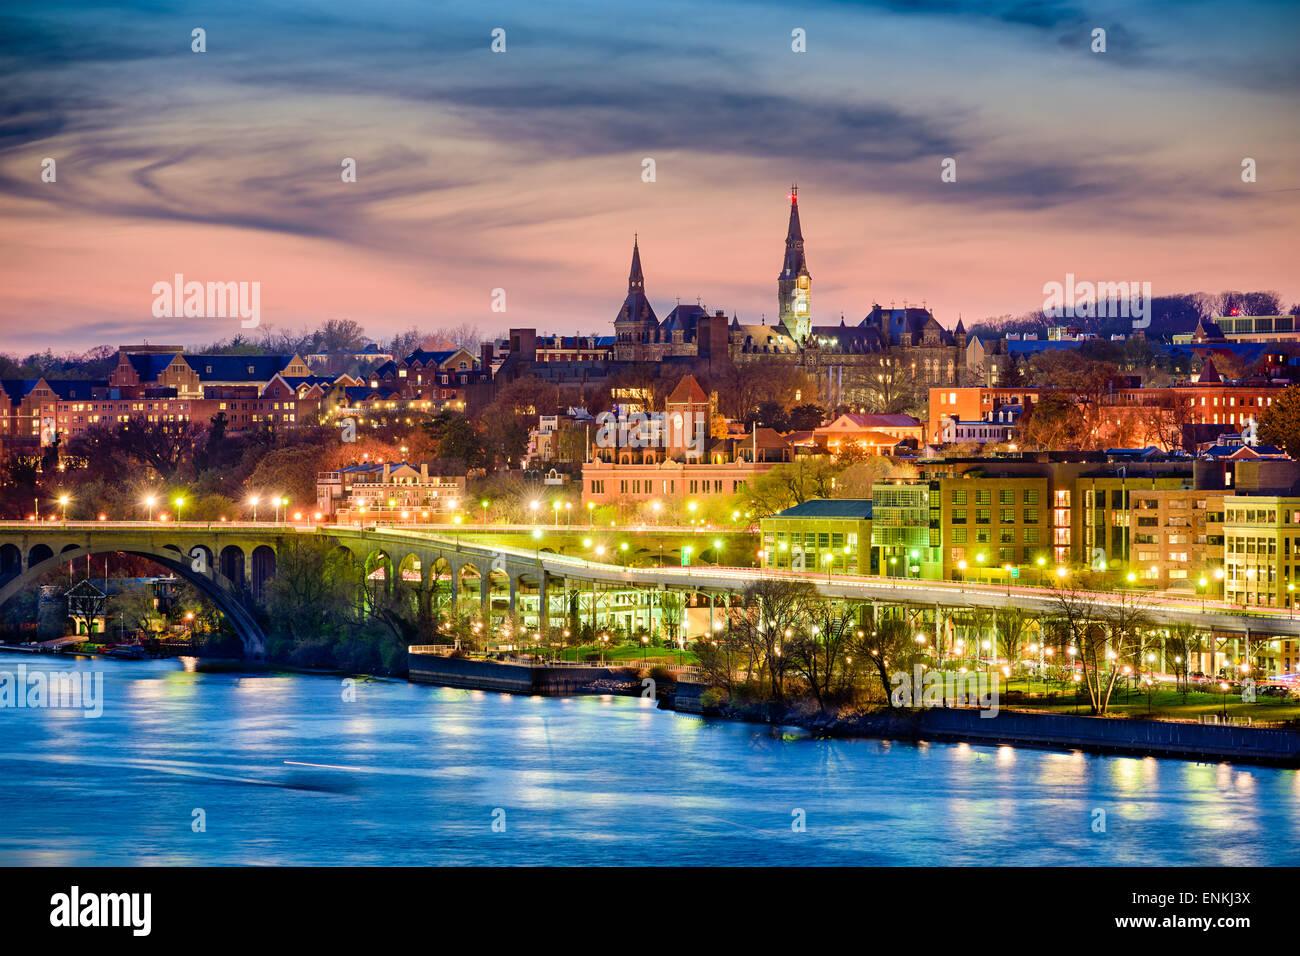 Georgetown, Washington, DC skyline on the Potomac River. - Stock Image